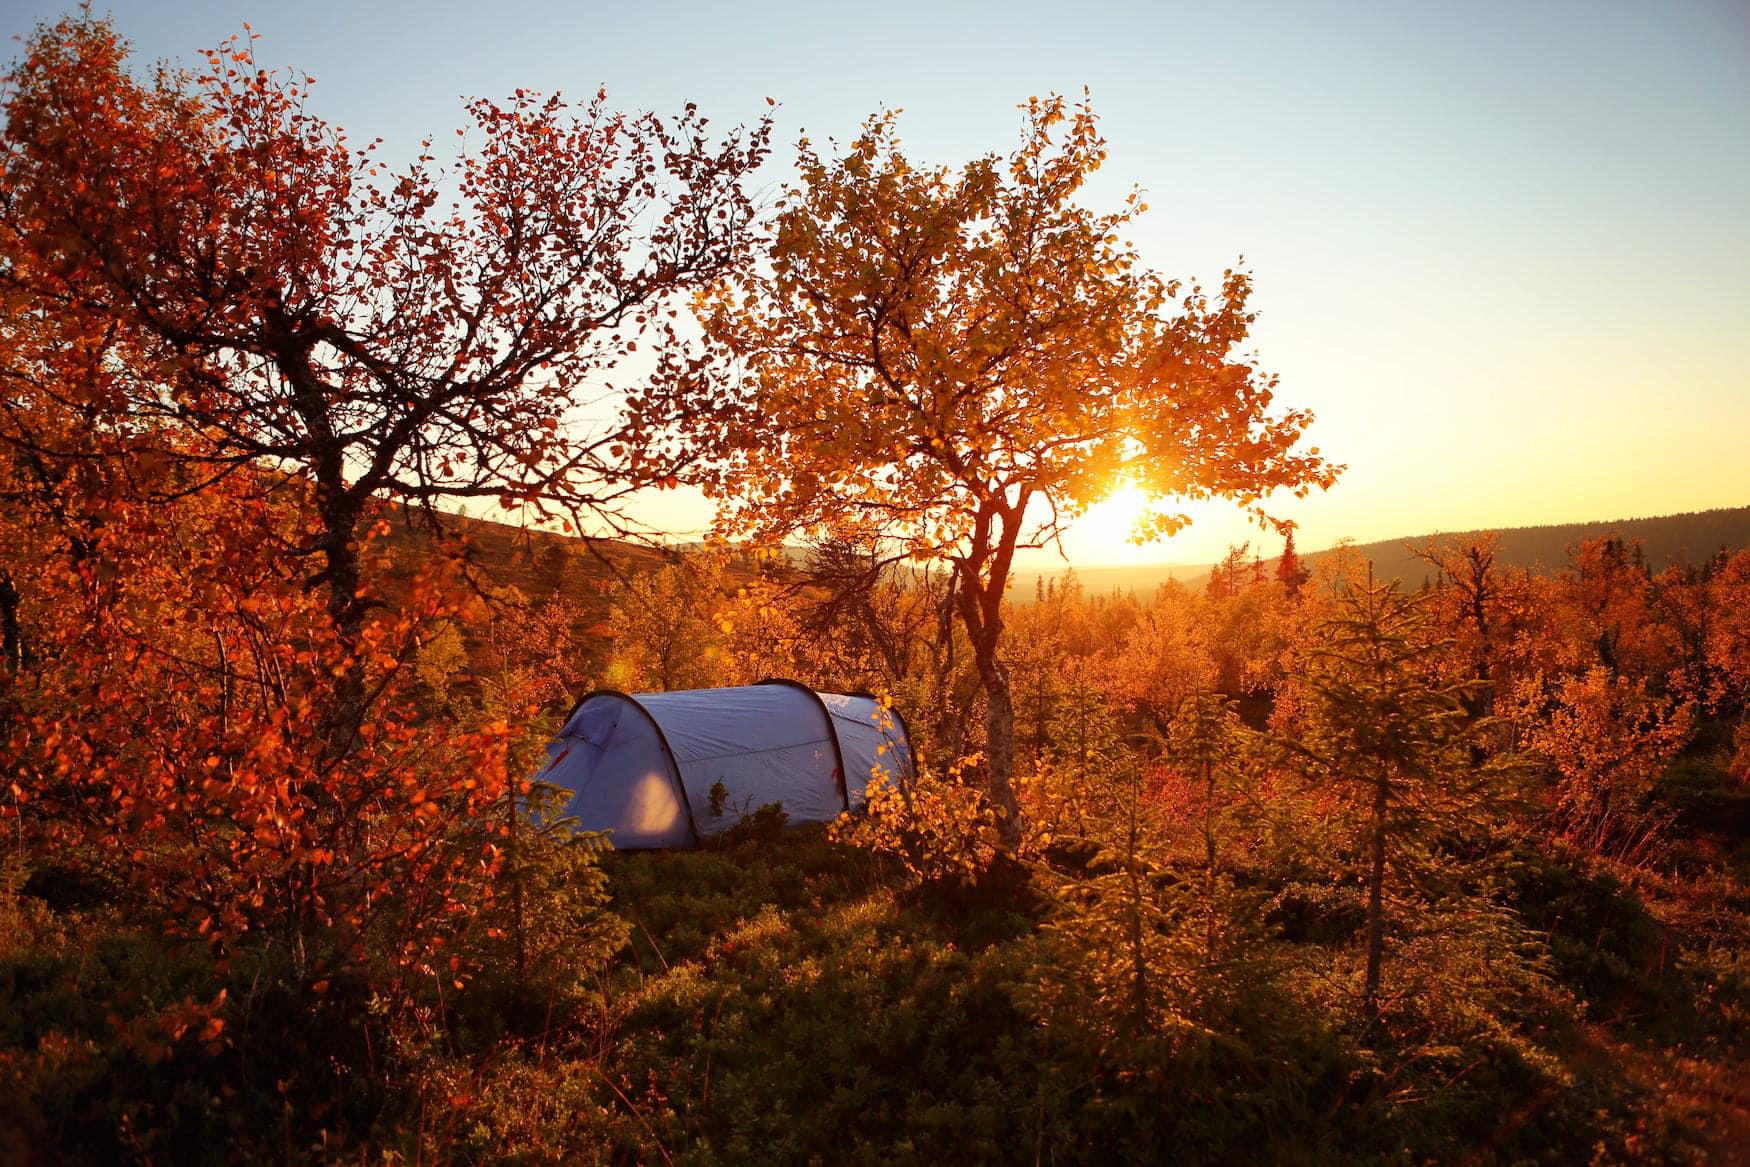 Herbst in Finnland, Indian Summer Farben